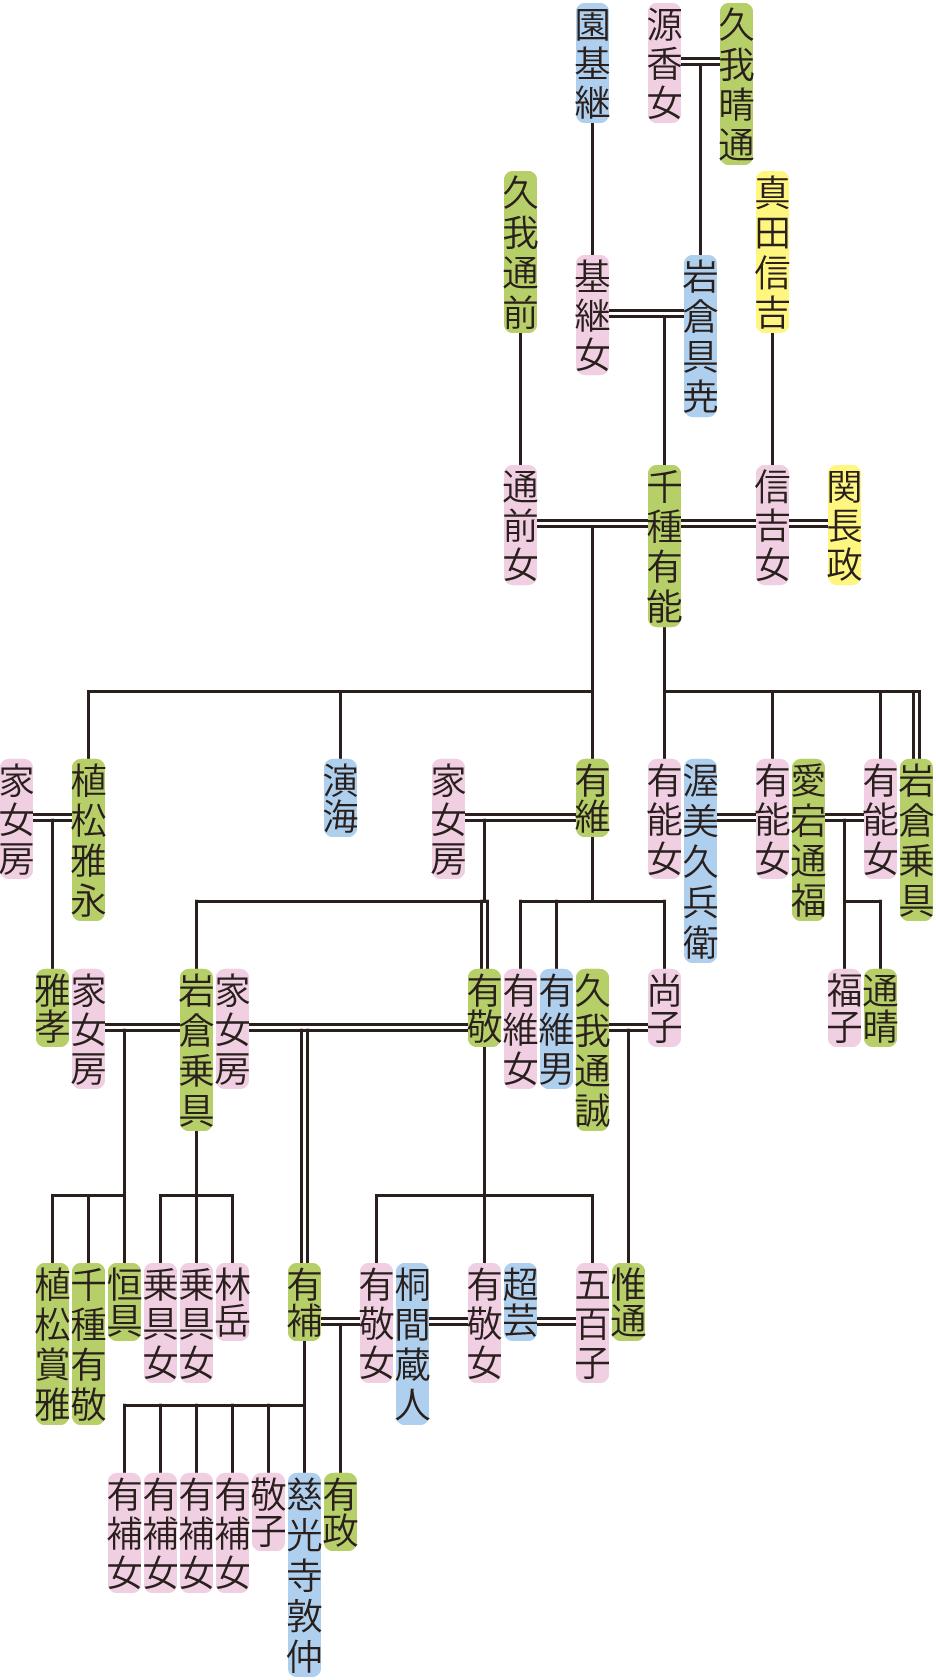 千種有能~有敬の系図